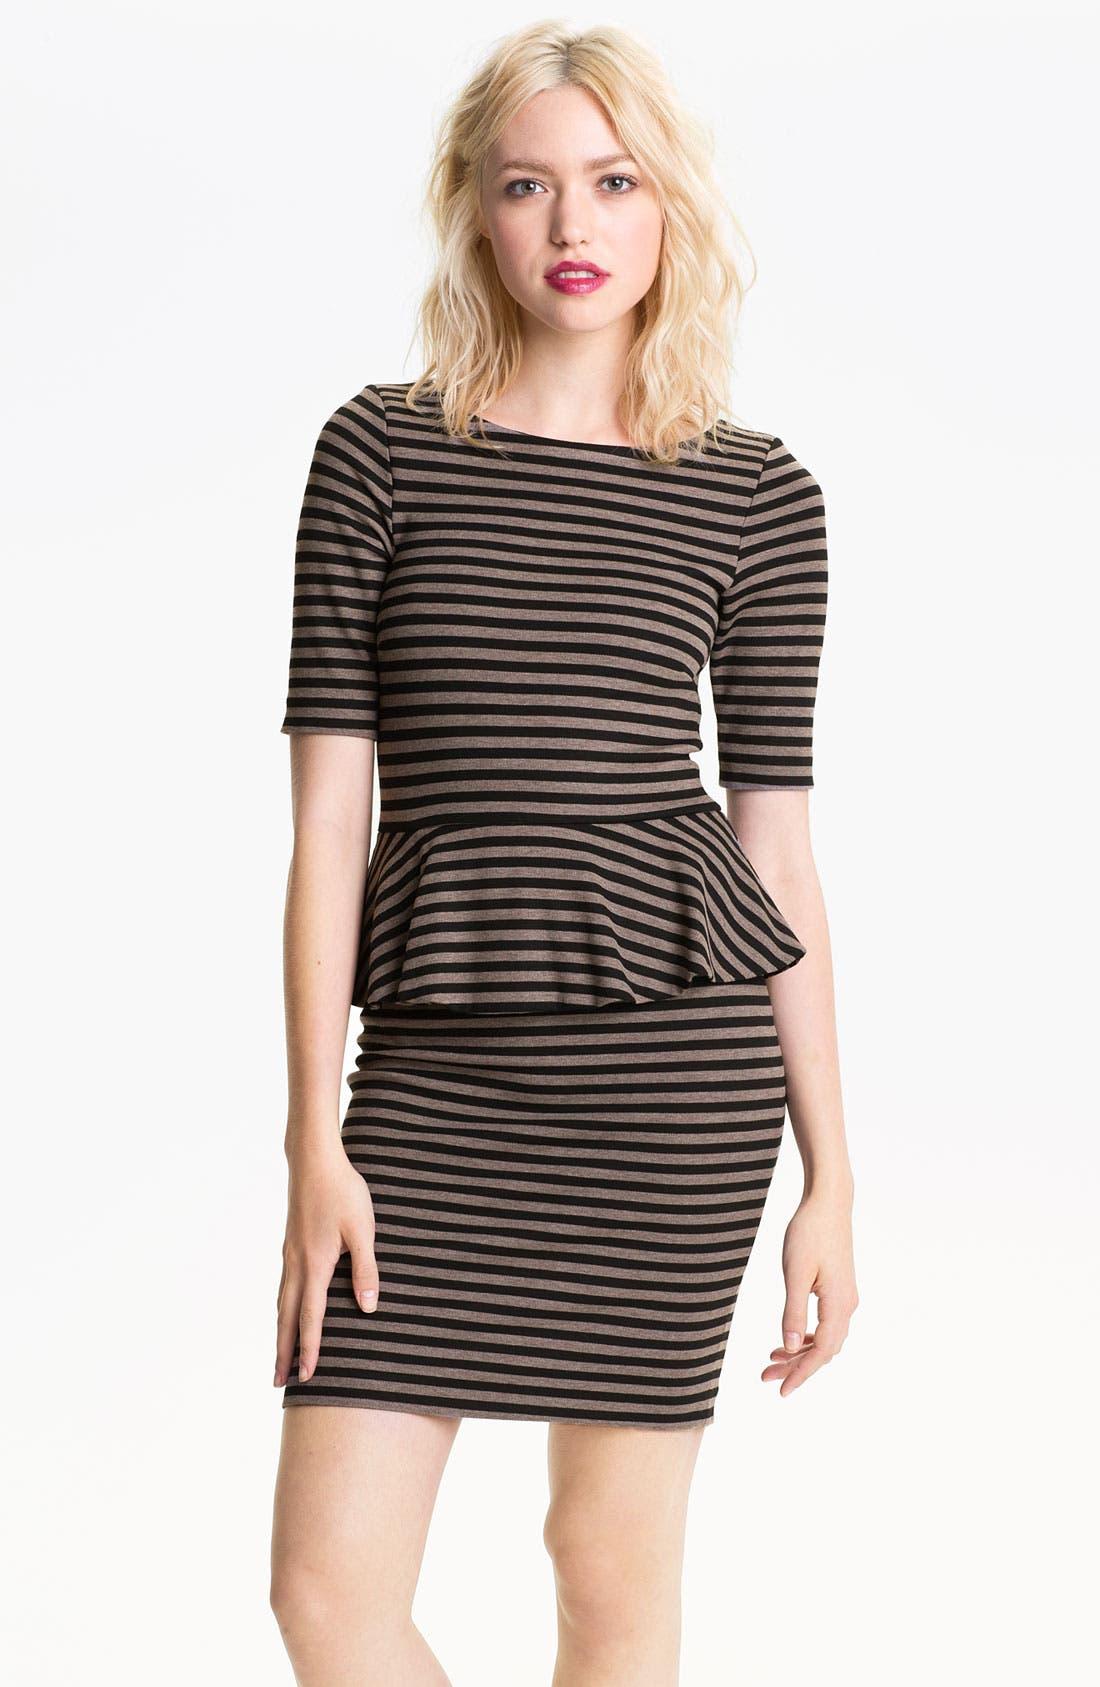 Alternate Image 1 Selected - Ella Moss 'Emily' Stripe Peplum Dress